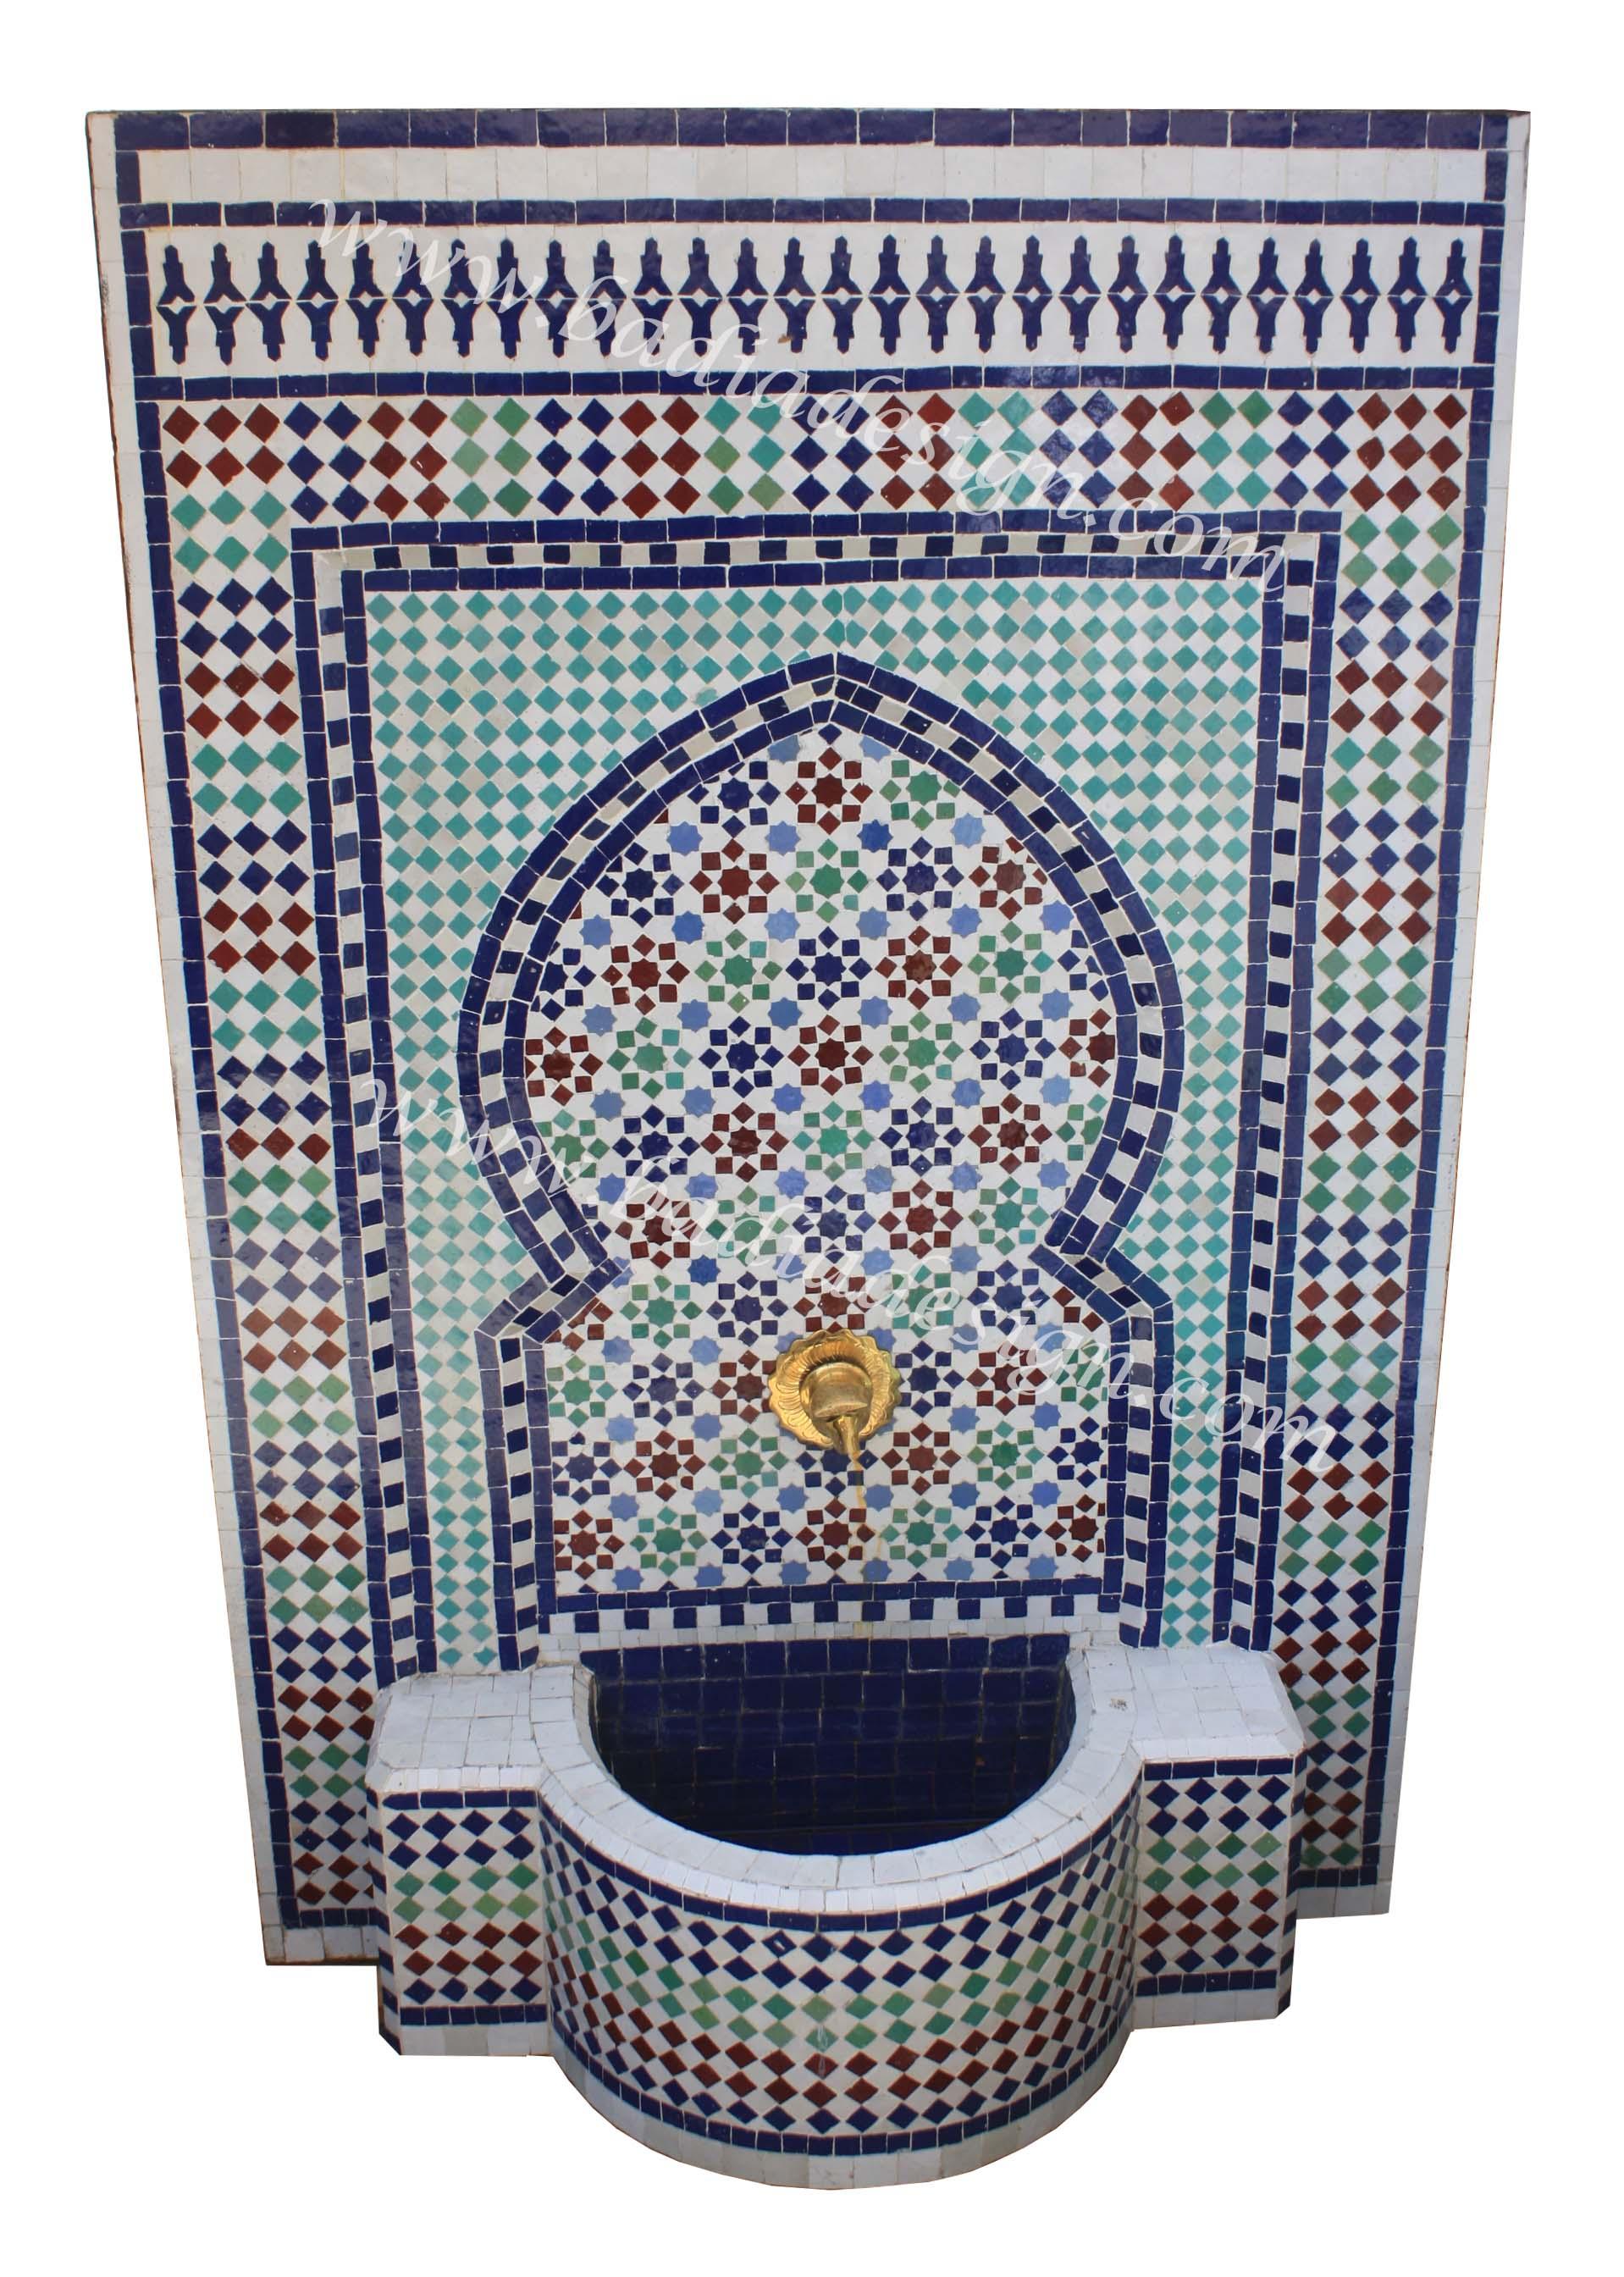 mosaic-water-fountain-los-angeles-mf644.jpg